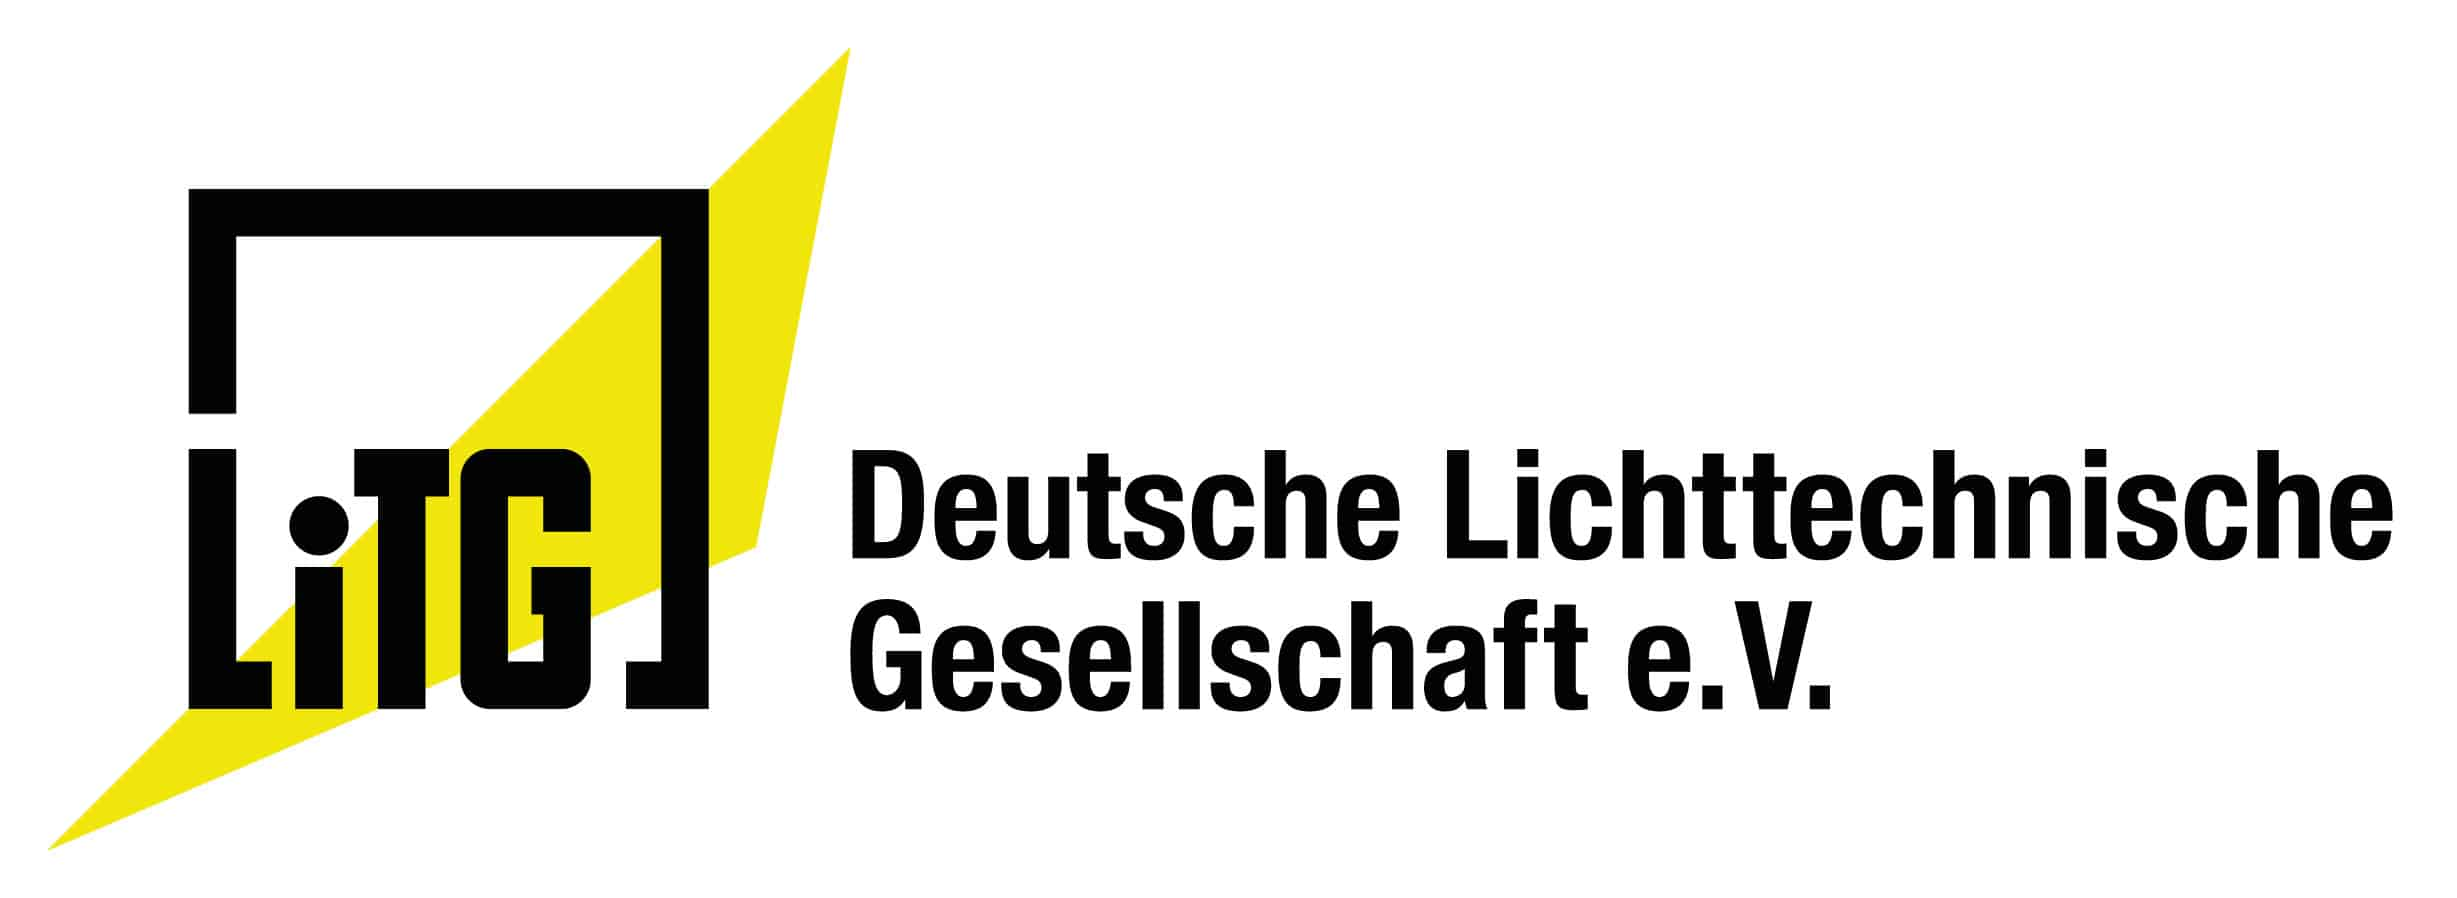 Deutsche Lichttechnische Gesellschaft e.V.